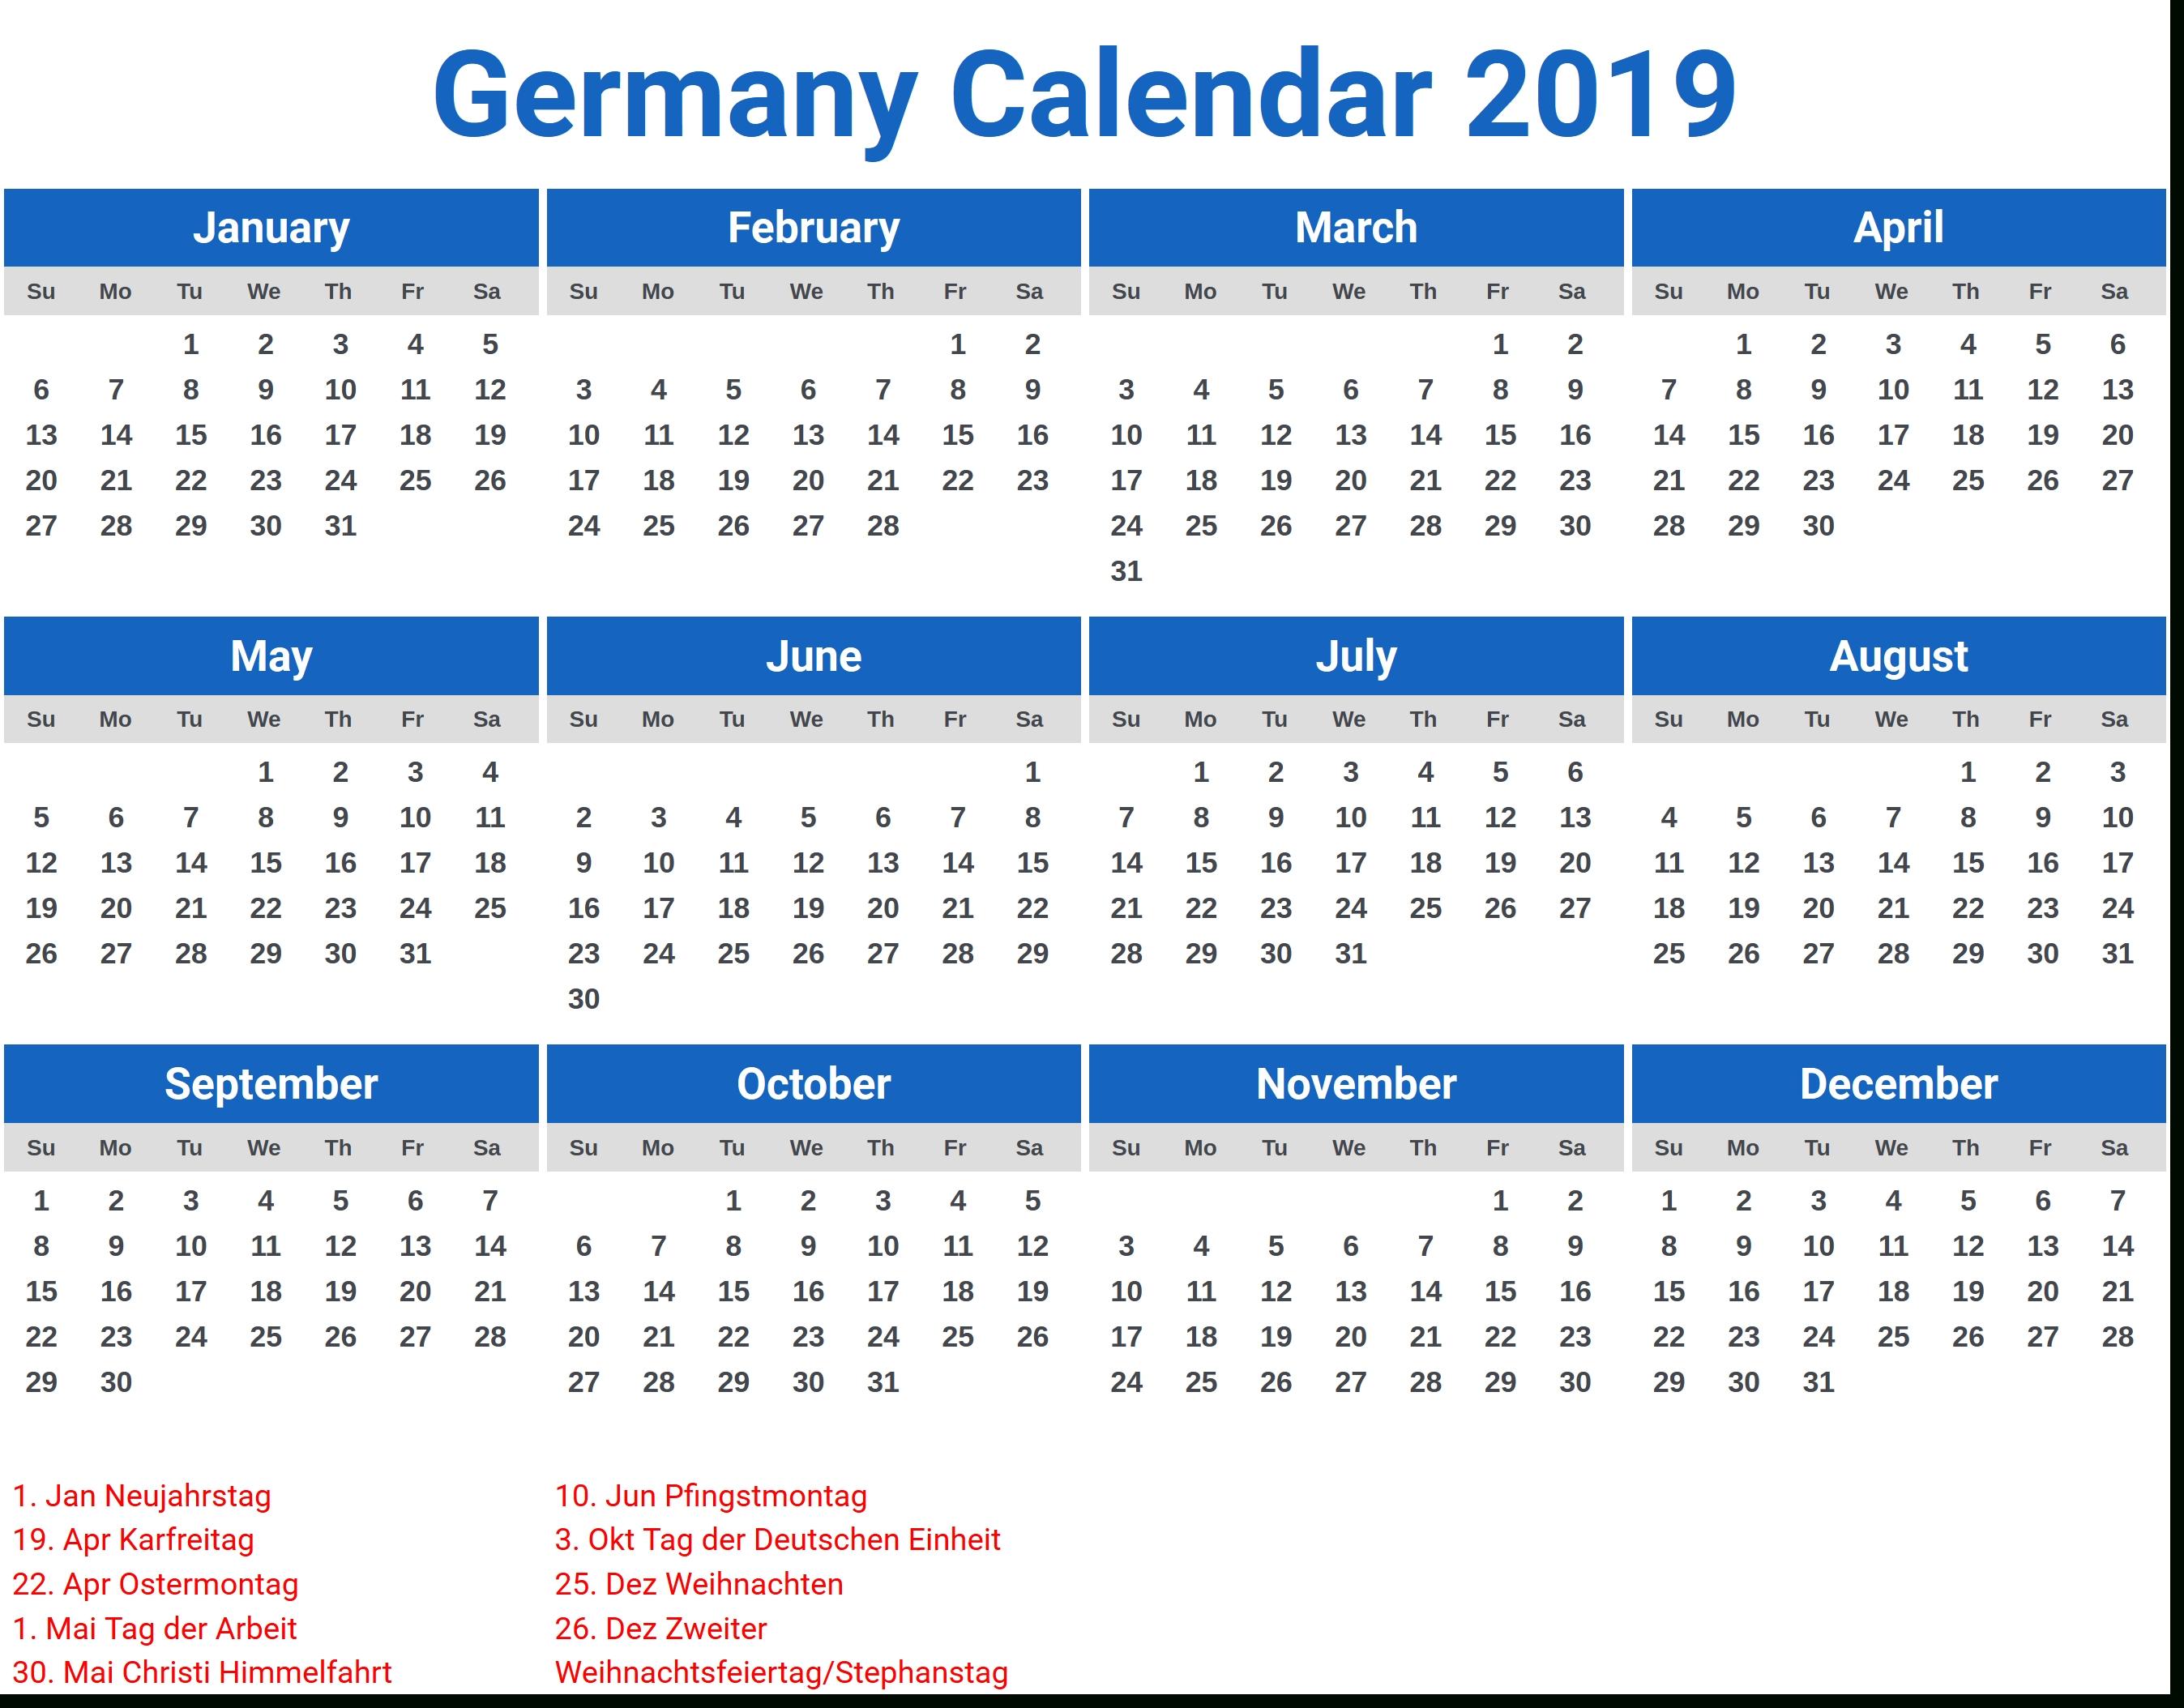 Germany 2019 Calendar With Holidays | 2019 Calendars | Pinterest Calendar 2019 Germany